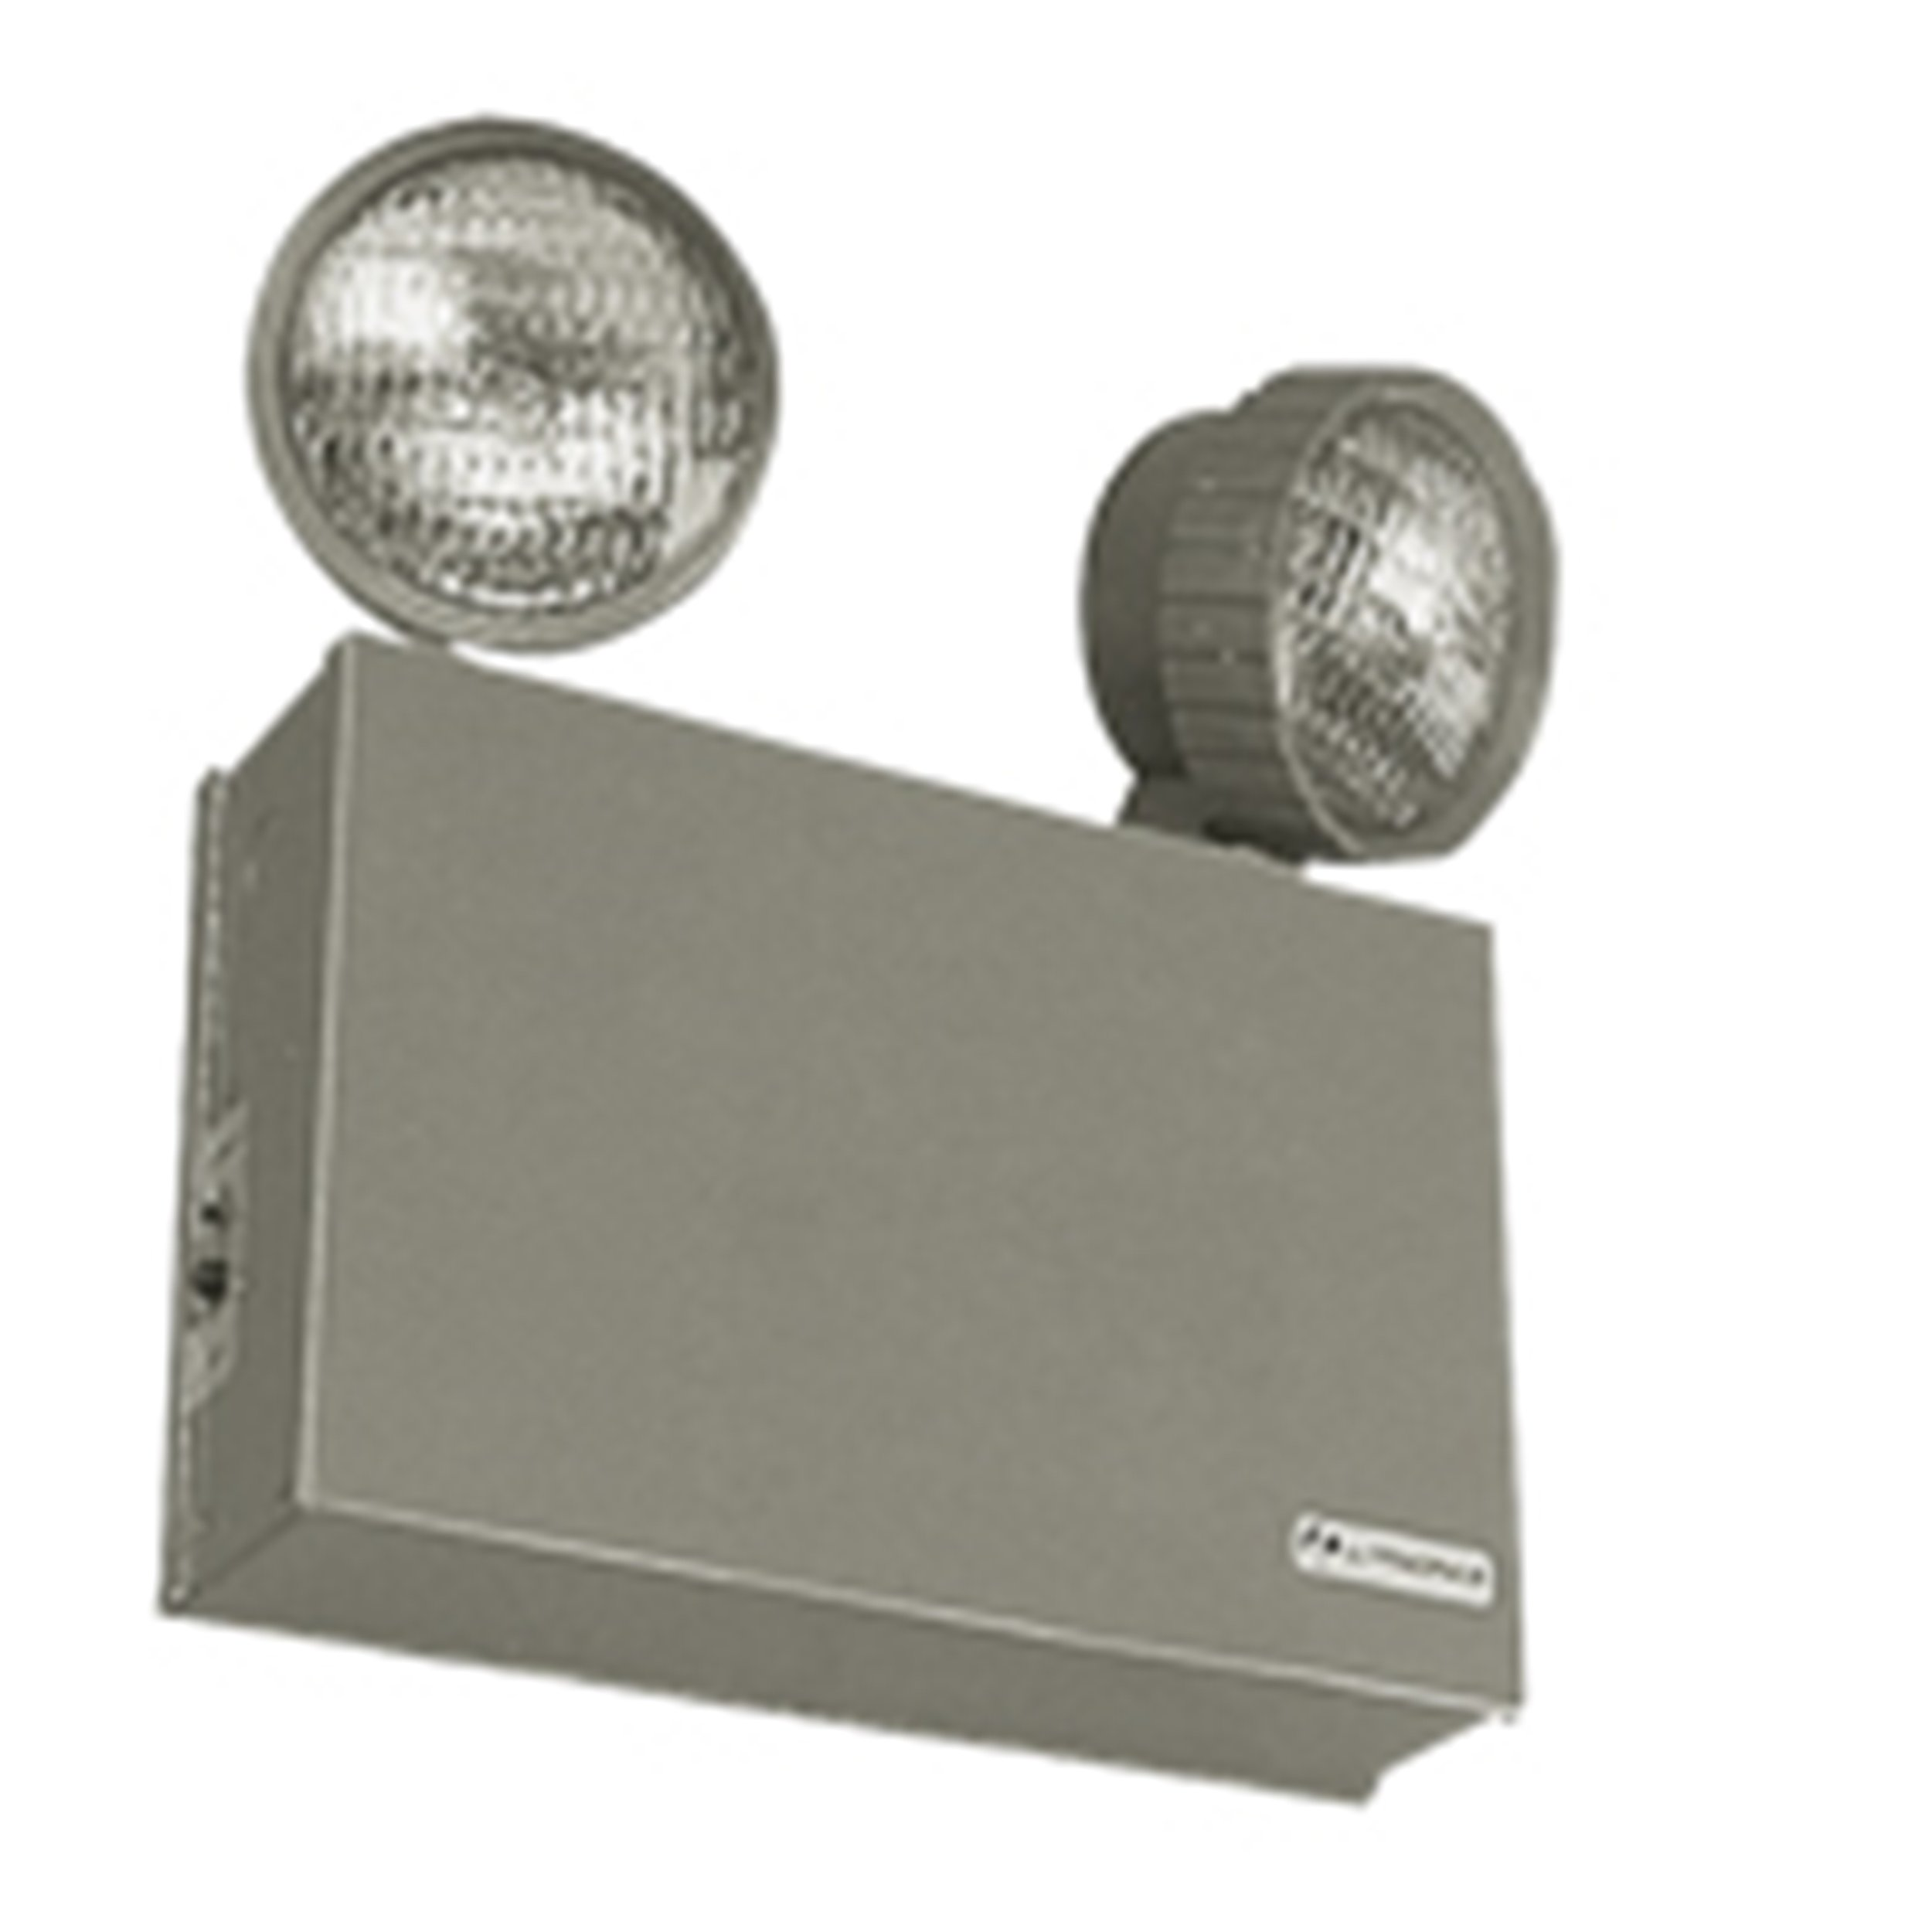 Lithonia Lighting ELT16 16W 6V Steel Emergency Lighting Unit, Beige